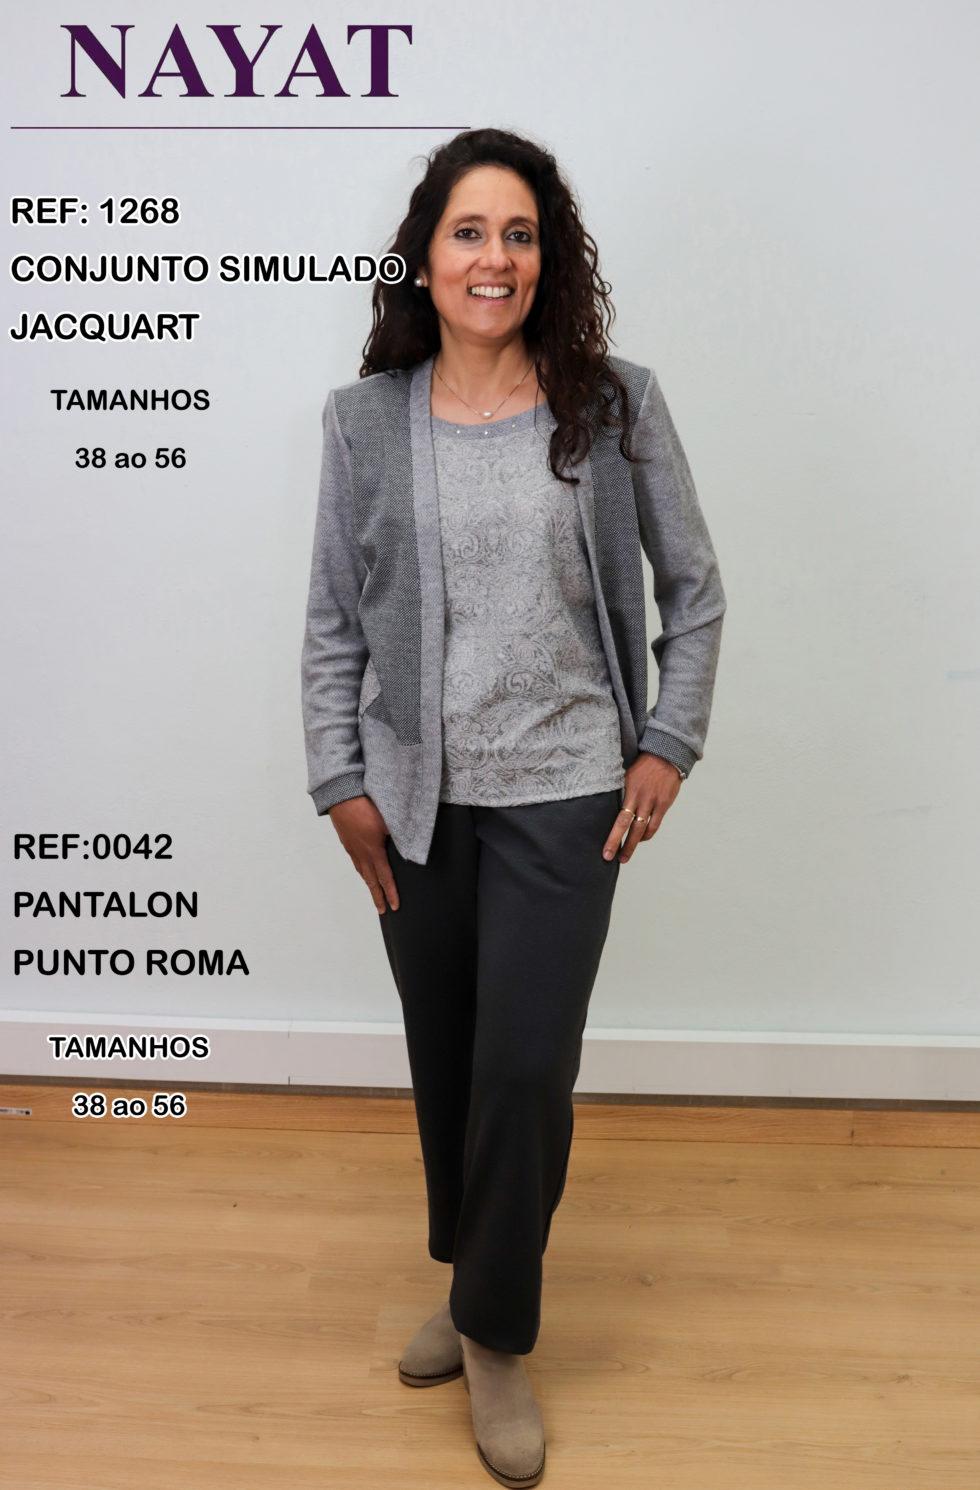 1268 + CALÇA 0042